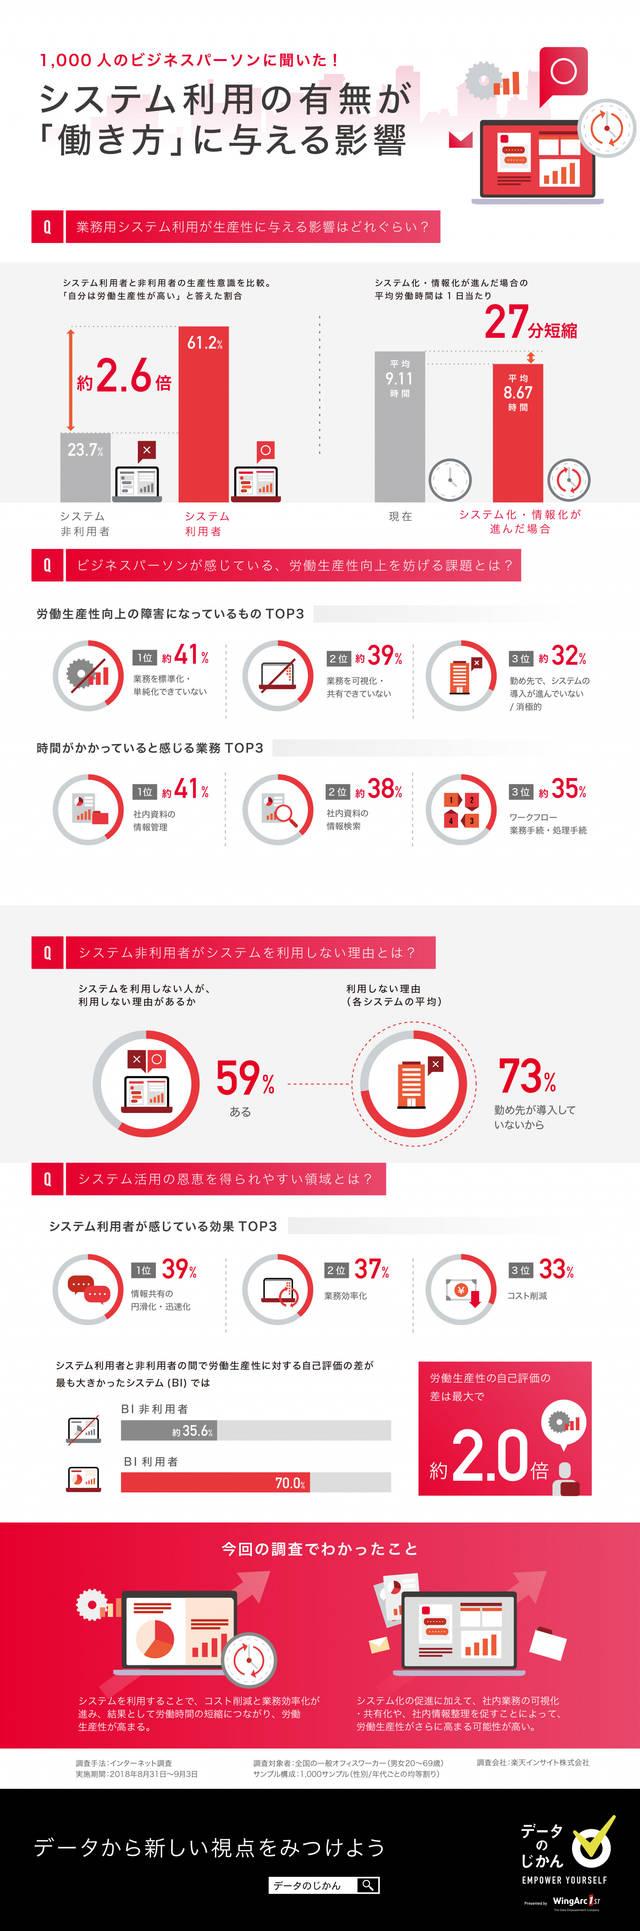 Dereport infographic 20190129 fix